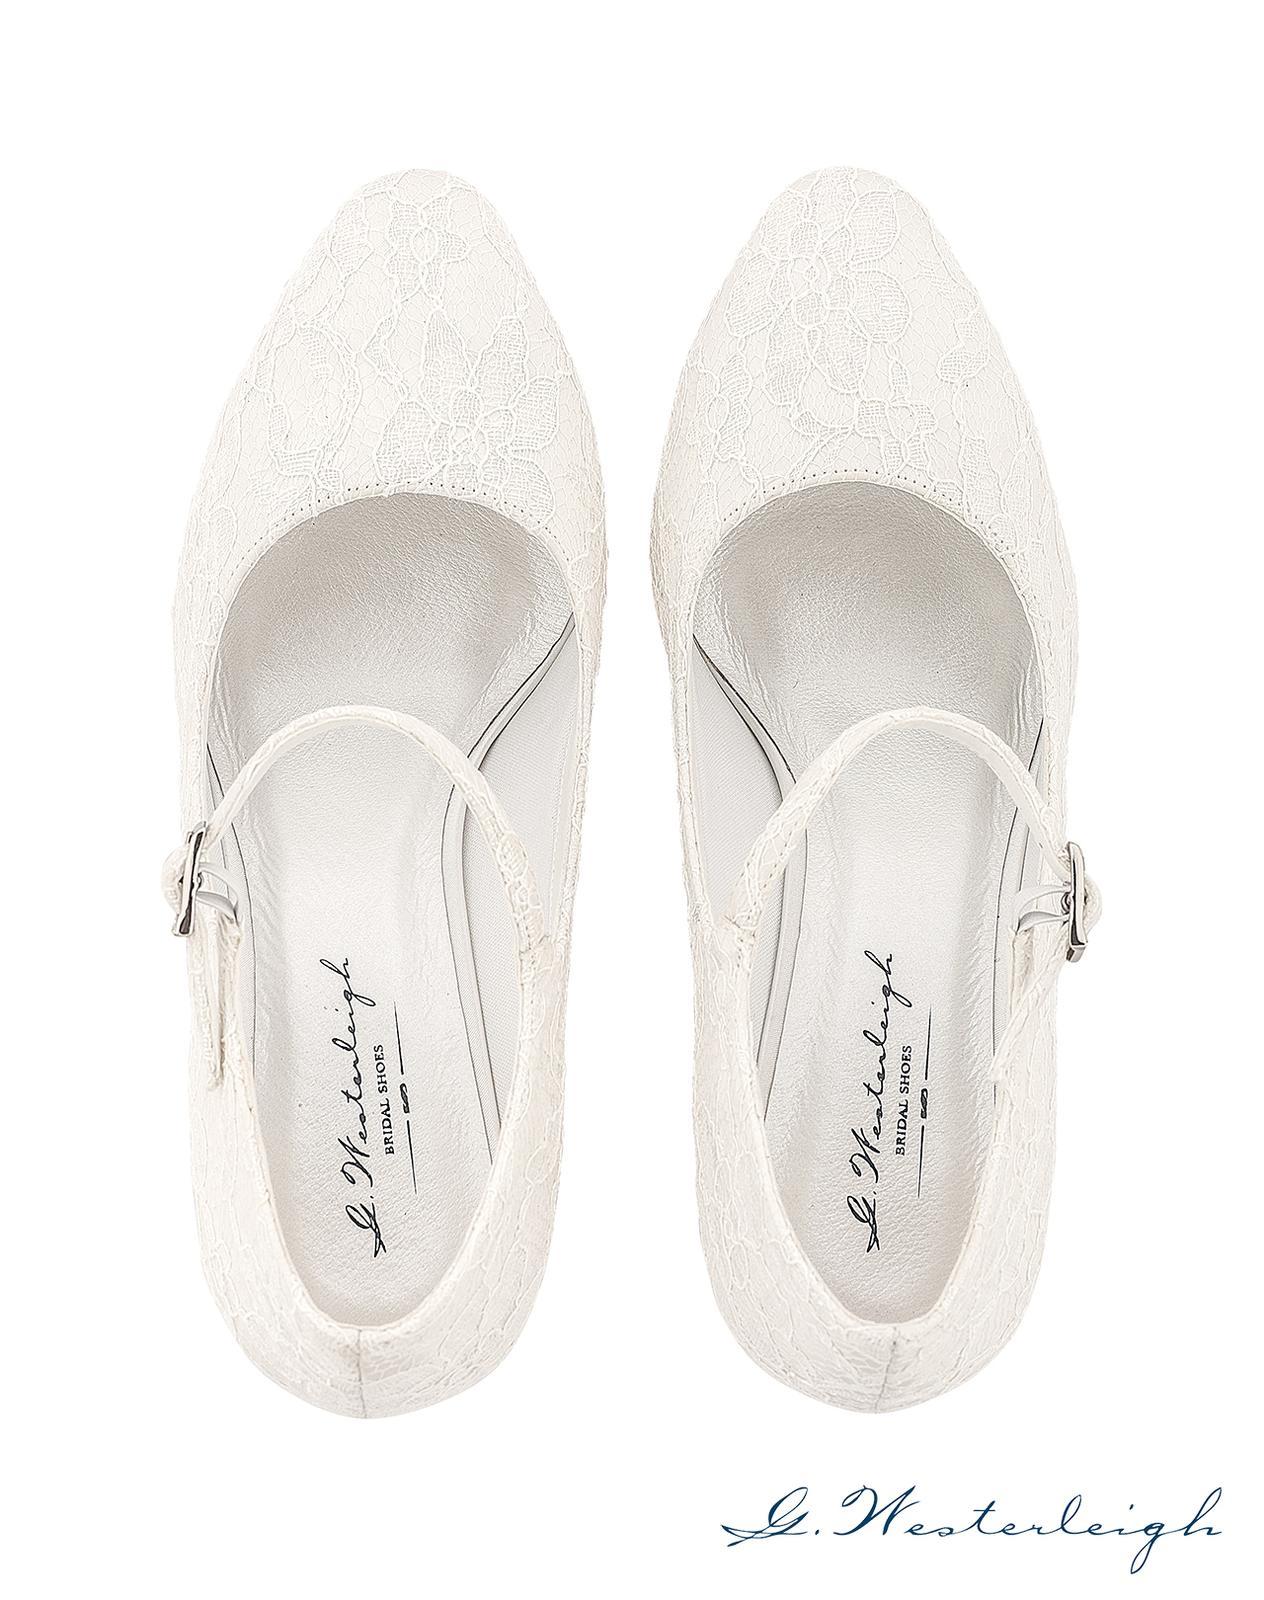 Svadobné topánky Agnes - Obrázok č. 3